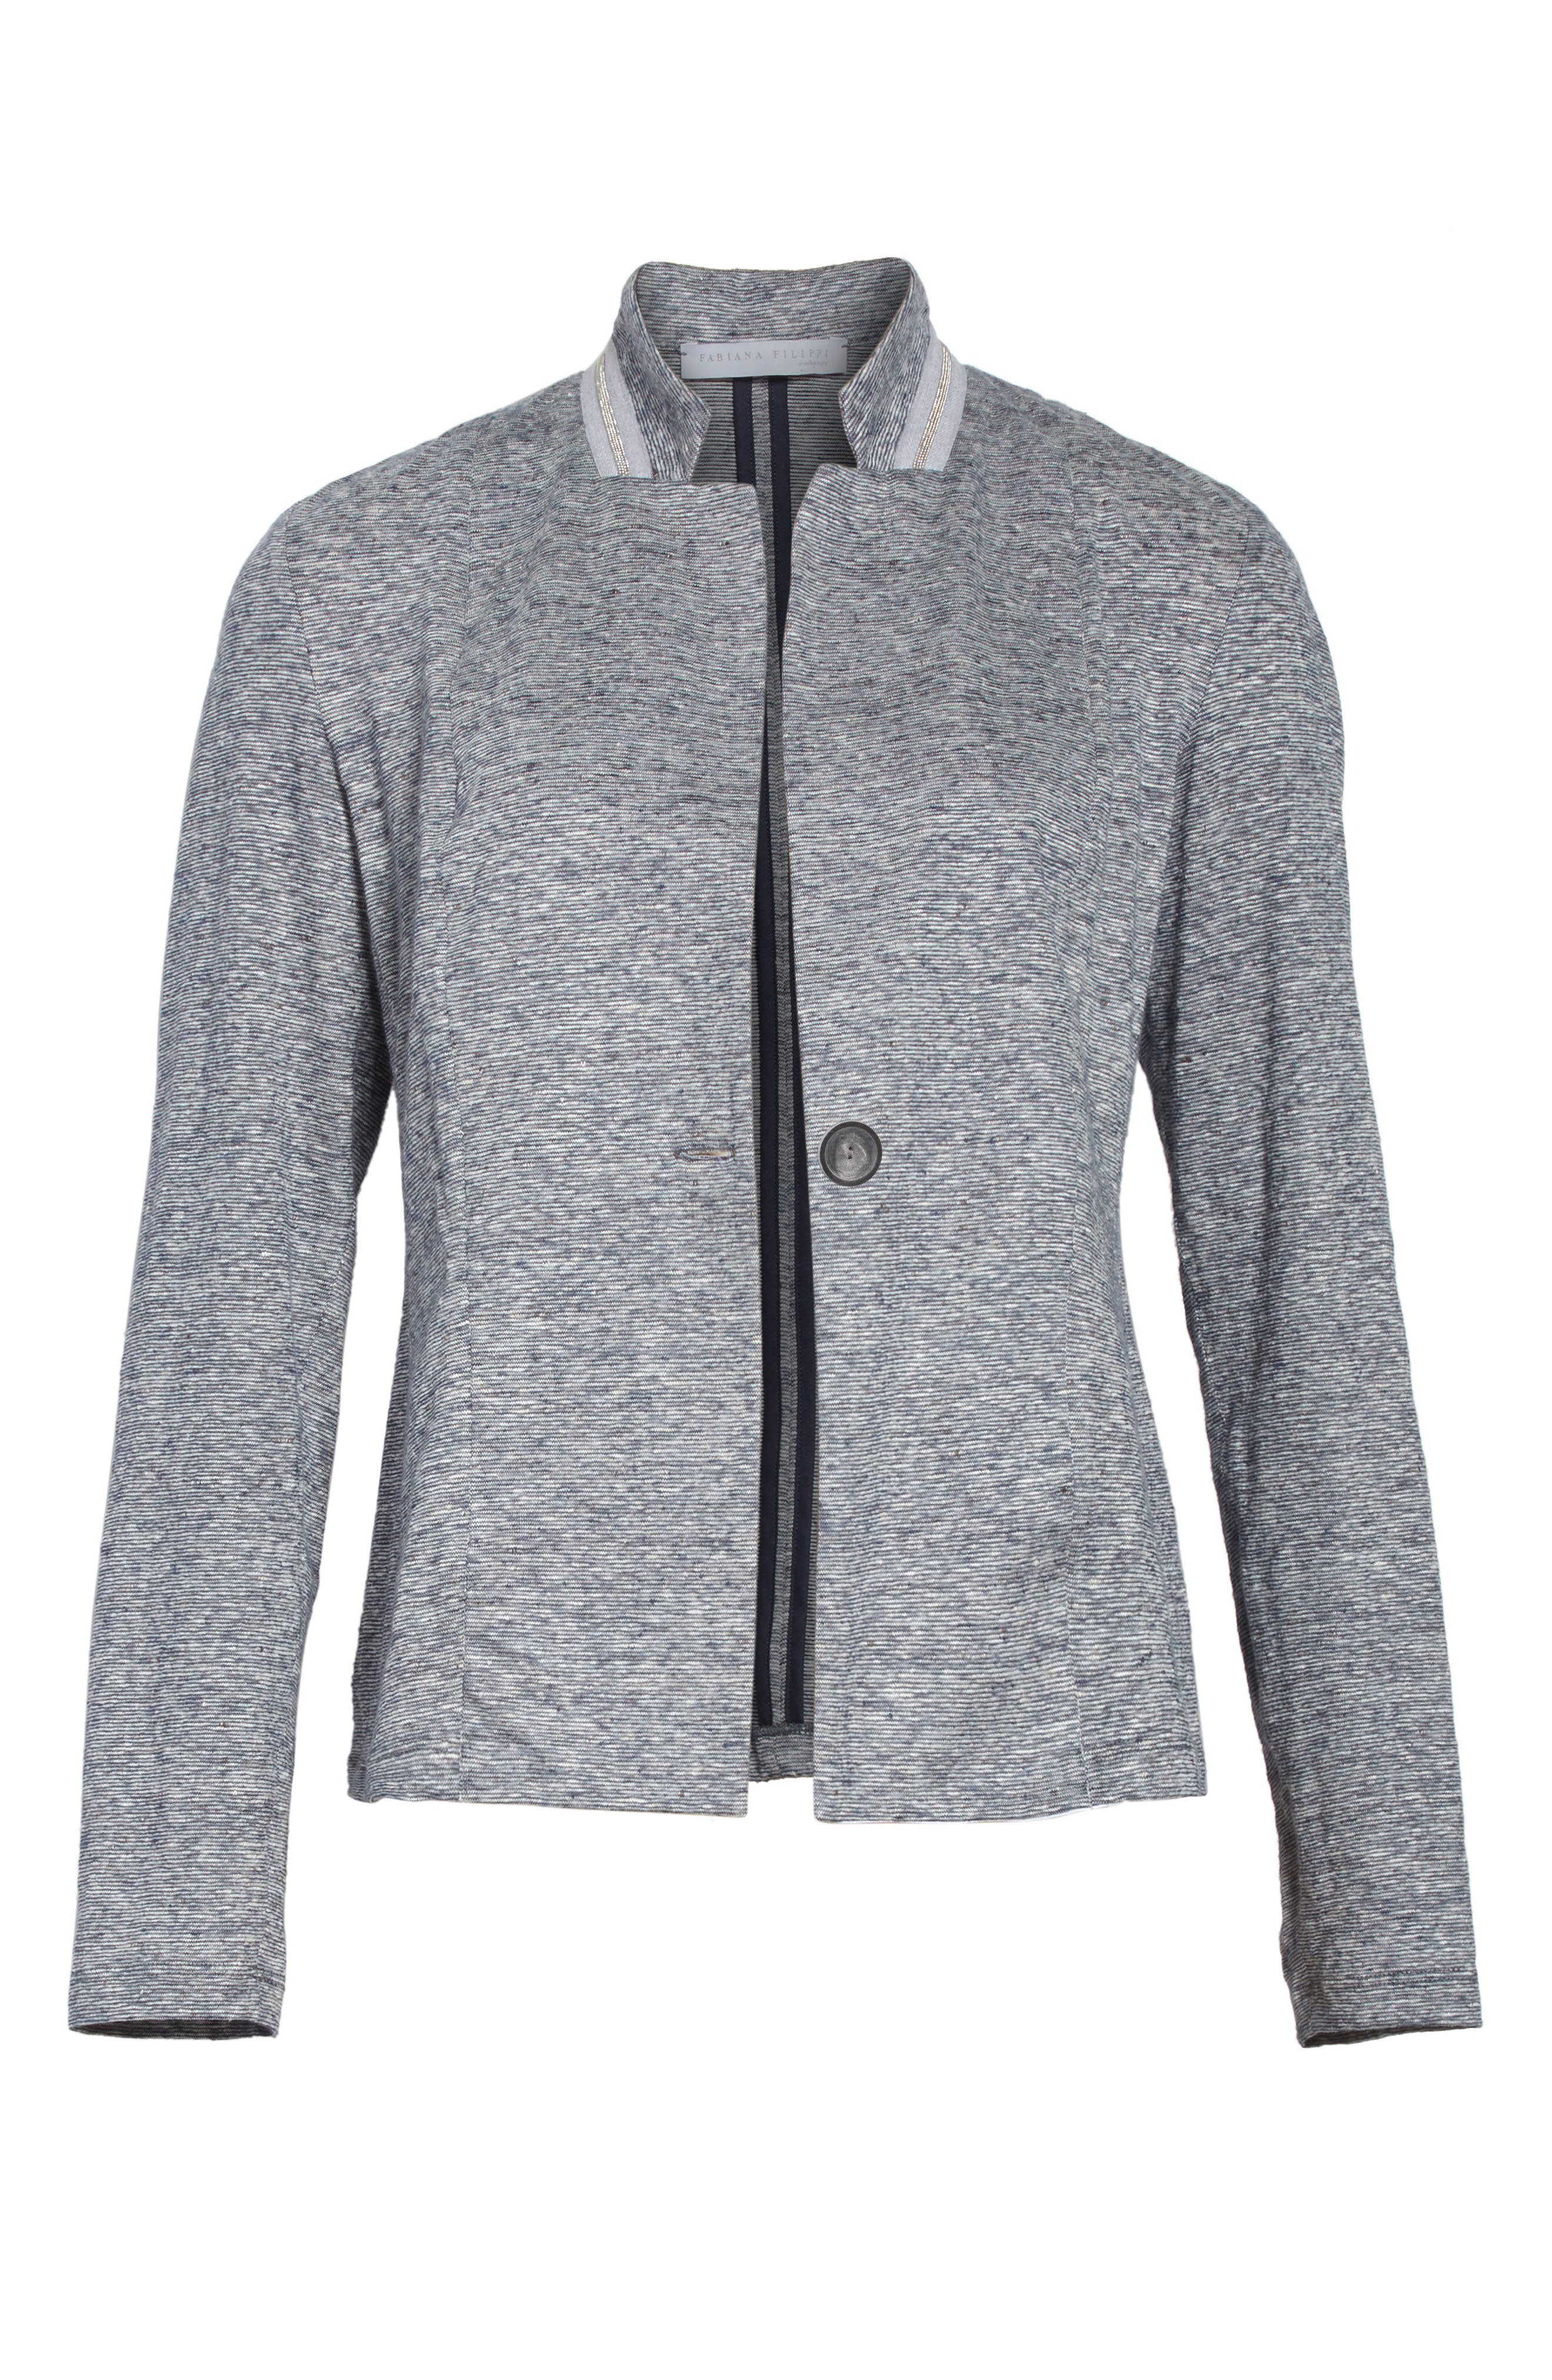 Grosgrain Stripe Jersey Jacket,                             Alternate thumbnail 5, color,                             400